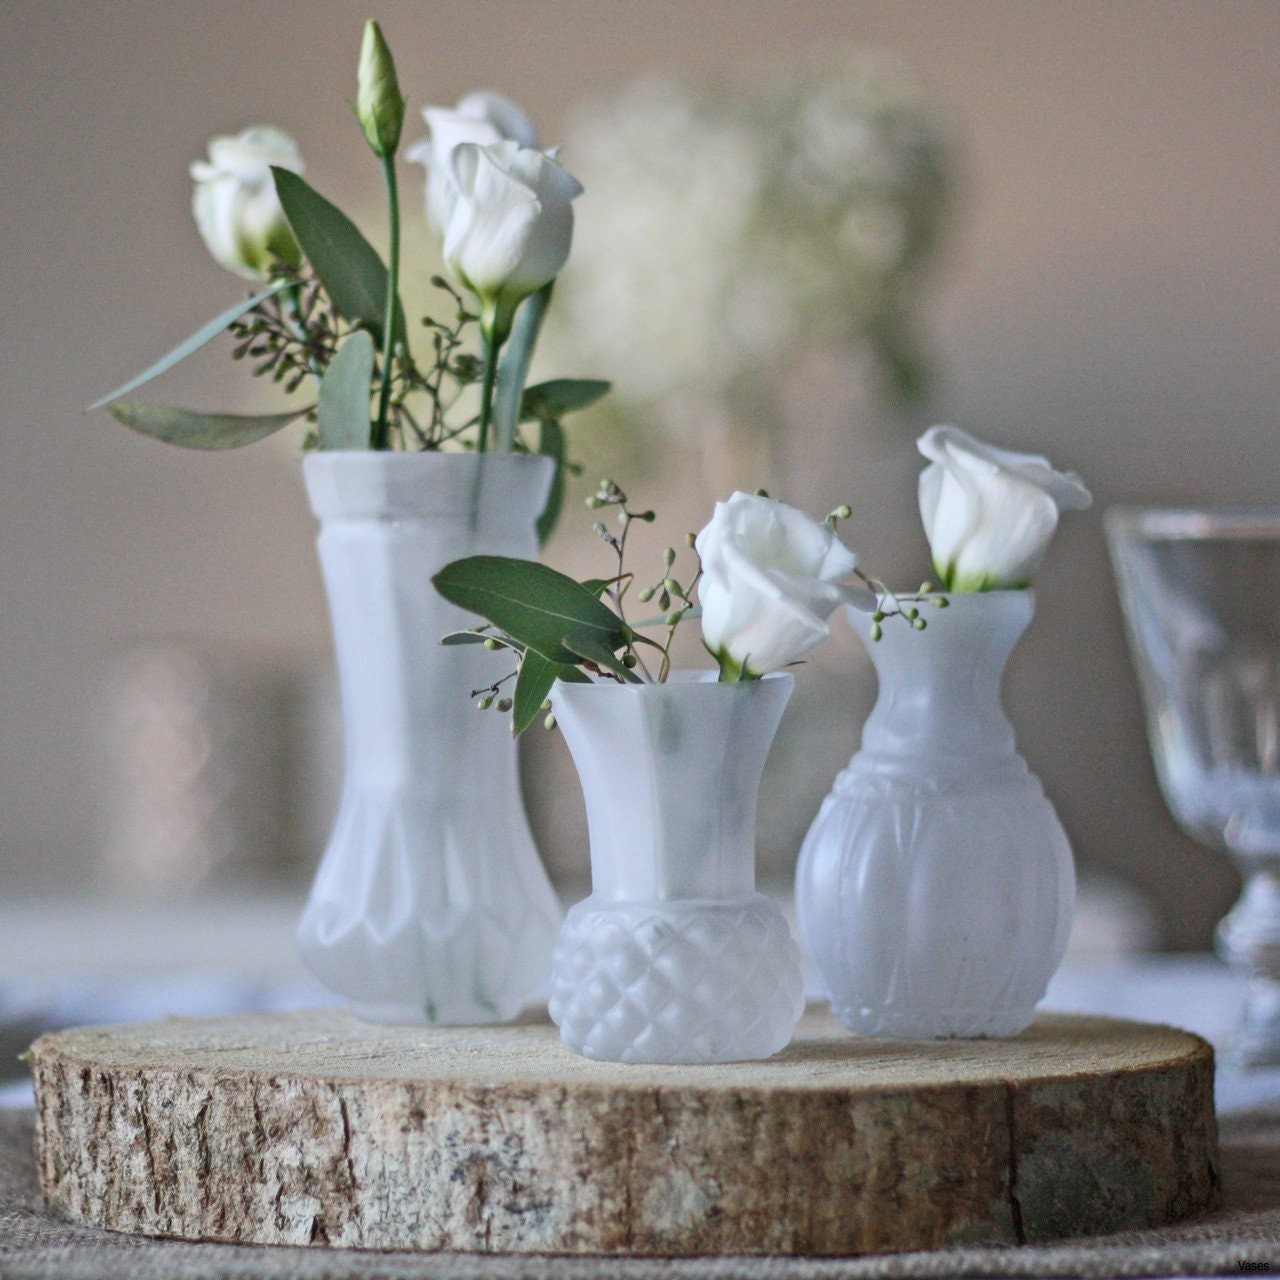 hand blown glass bud vase of glass bud vases stock jar flower 1h vases bud wedding vase within glass bud vases stock jar flower 1h vases bud wedding vase centerpiece idea i 0d white